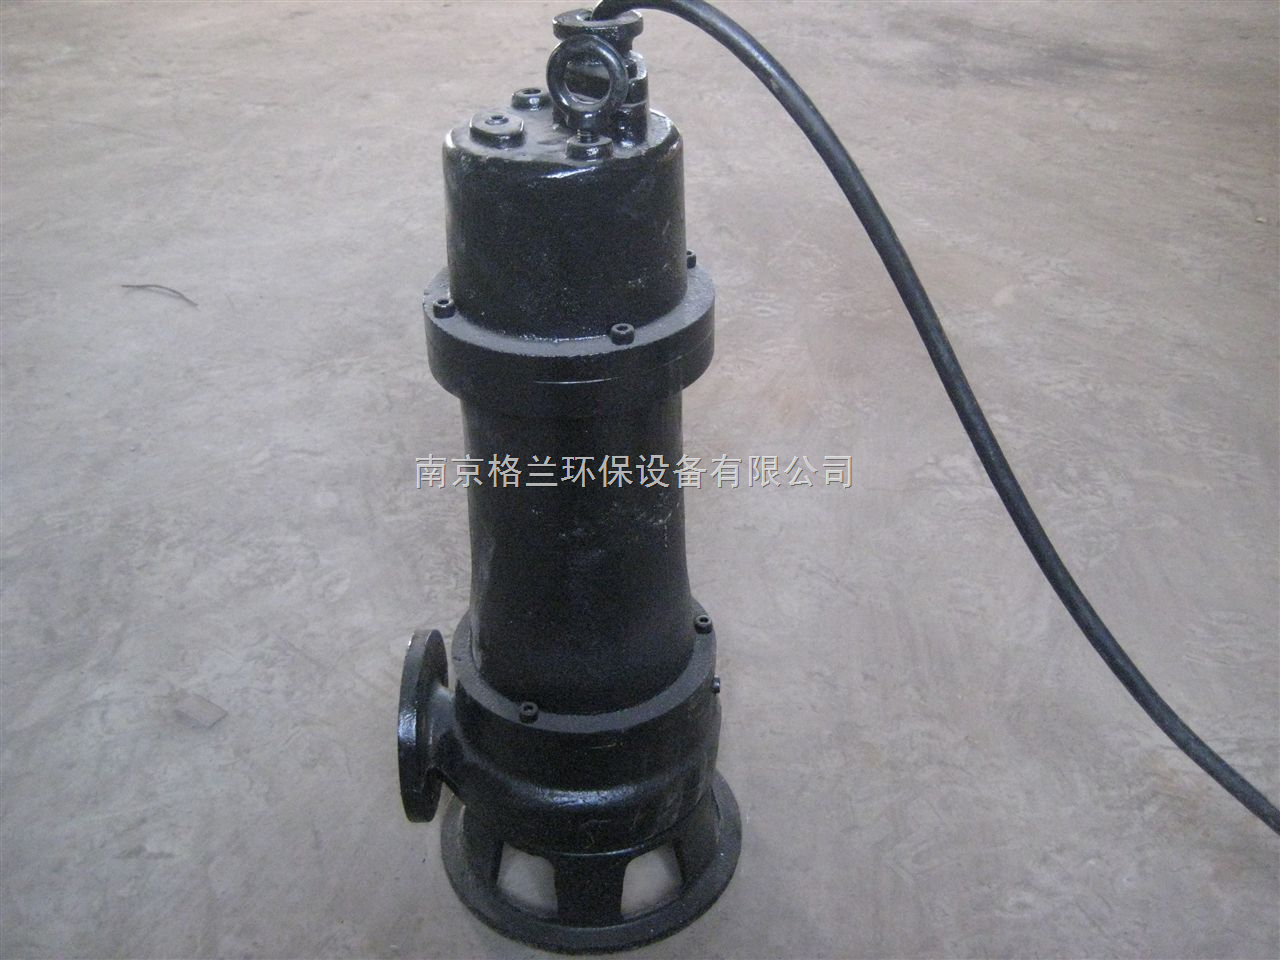 5kw单相潜水排污泵